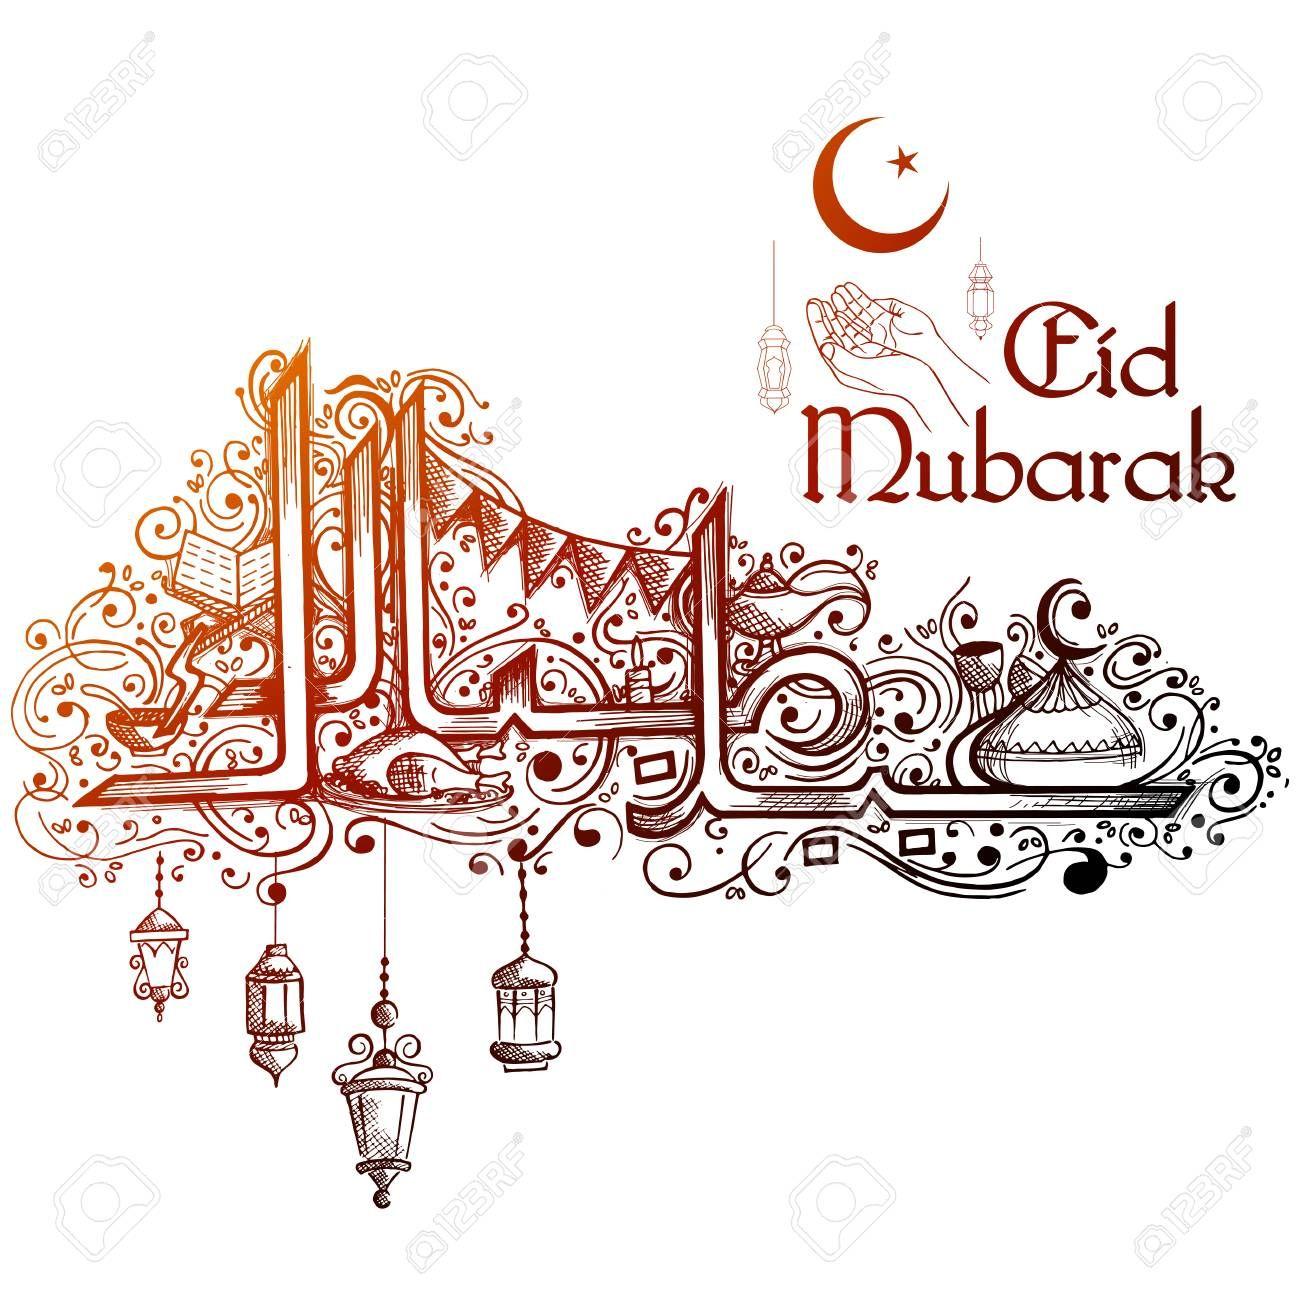 Eid Mubarak Happy Eid Greetings In Arabic Freehand With Mosque Eid Greetings Eid Mubarak In Arabic Eid Mubarak Images